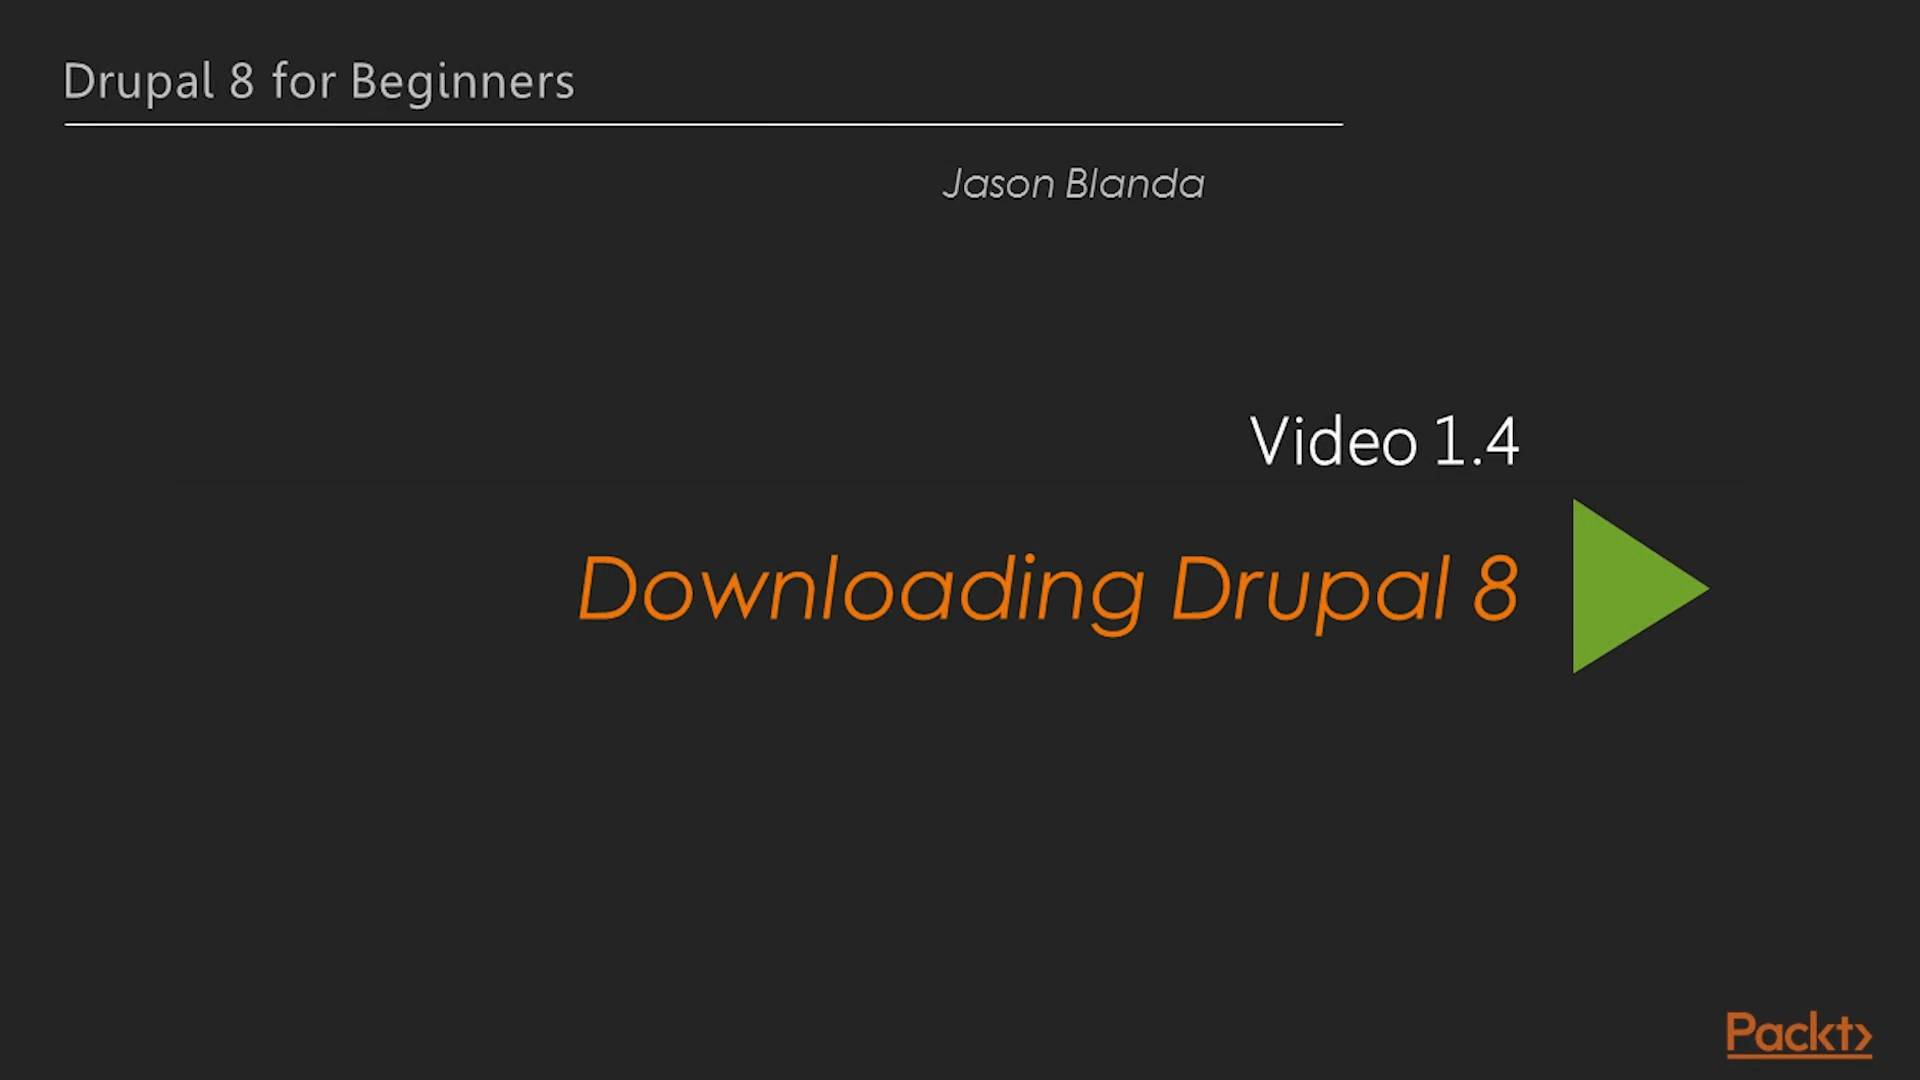 Drupal 8 for Beginners